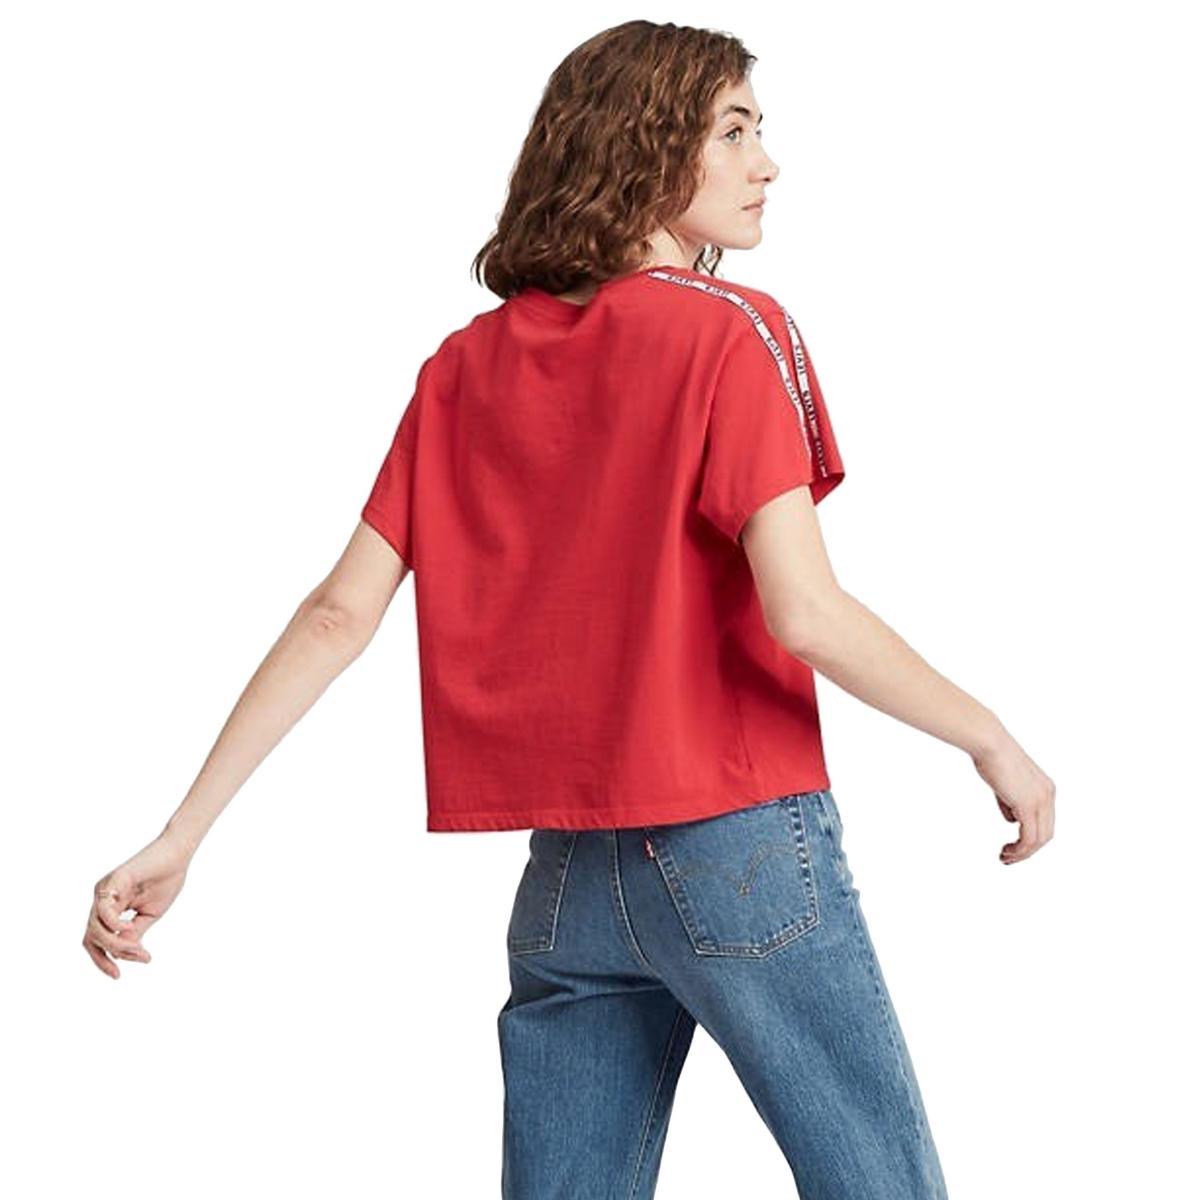 T-shirt Levi's Varsity Tee girocollo con stampe da donna rif. 68979-0006